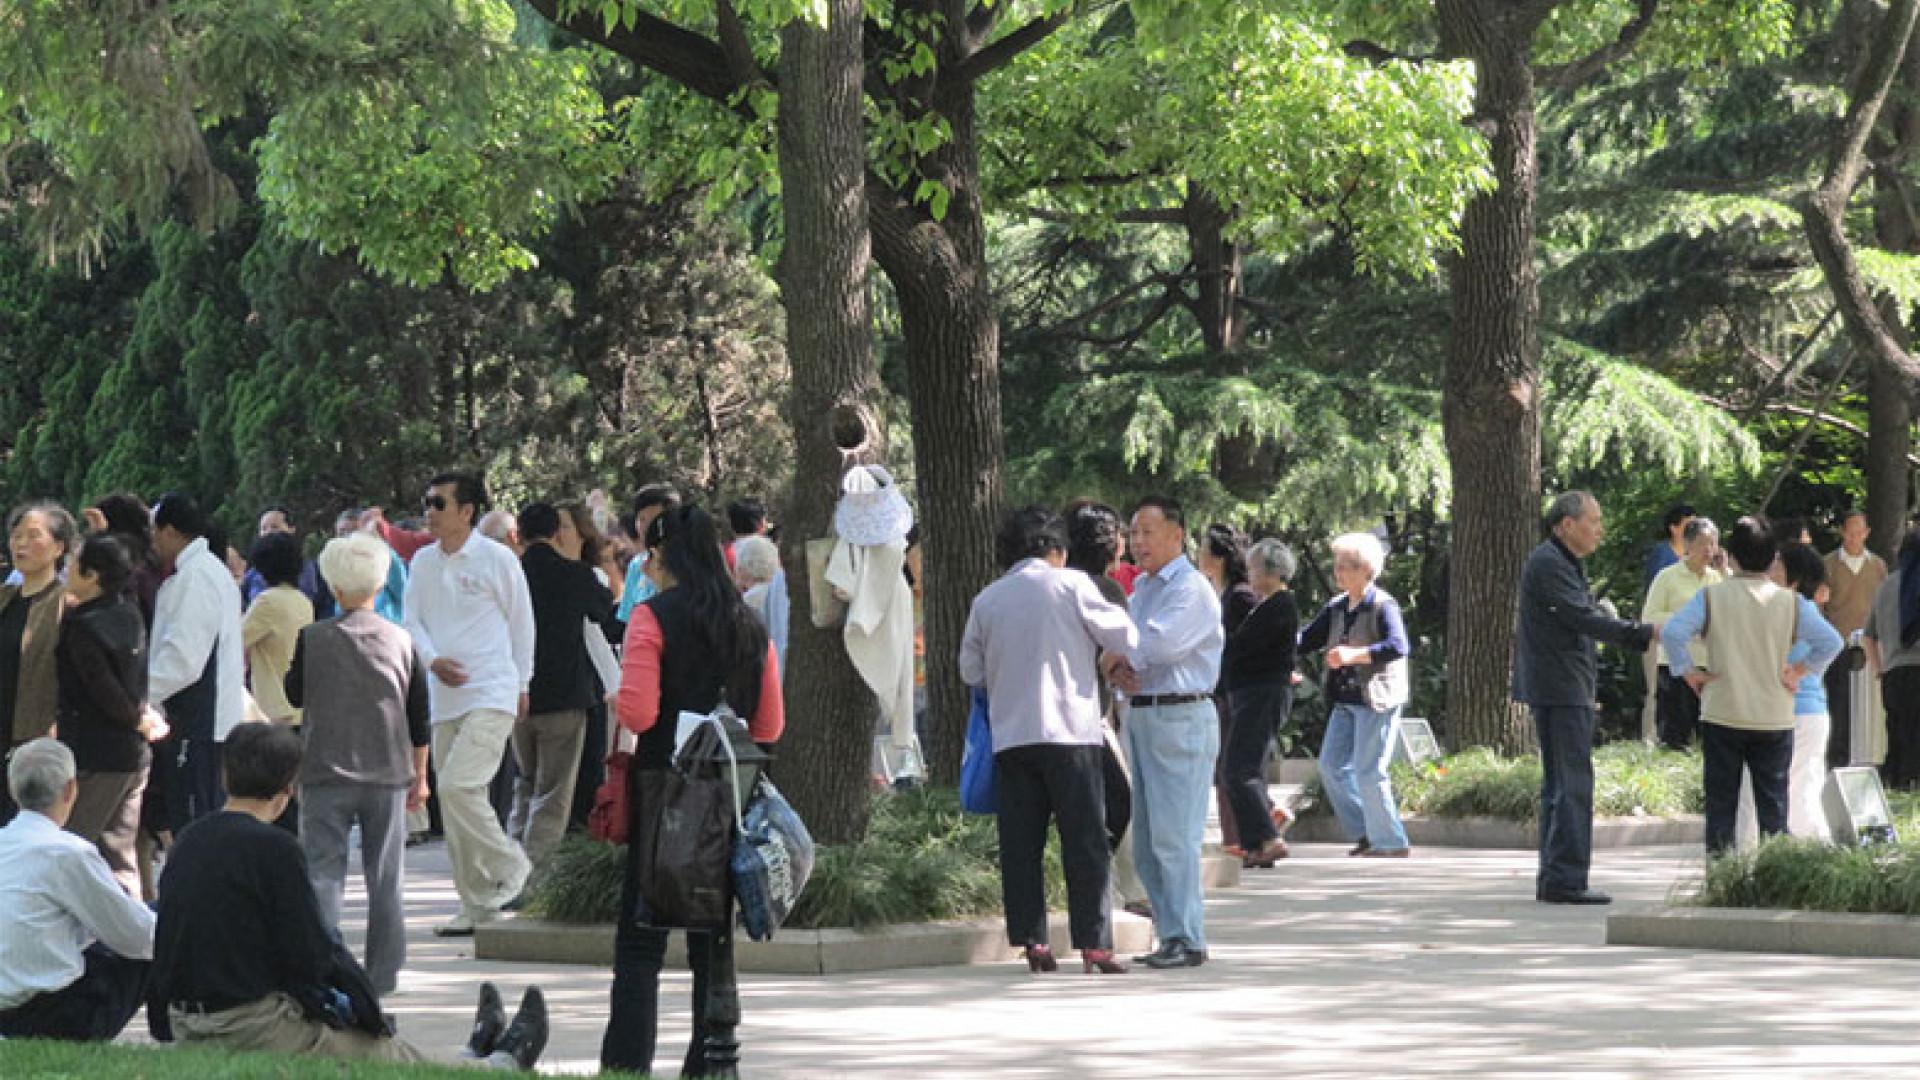 People's Park Chengdu